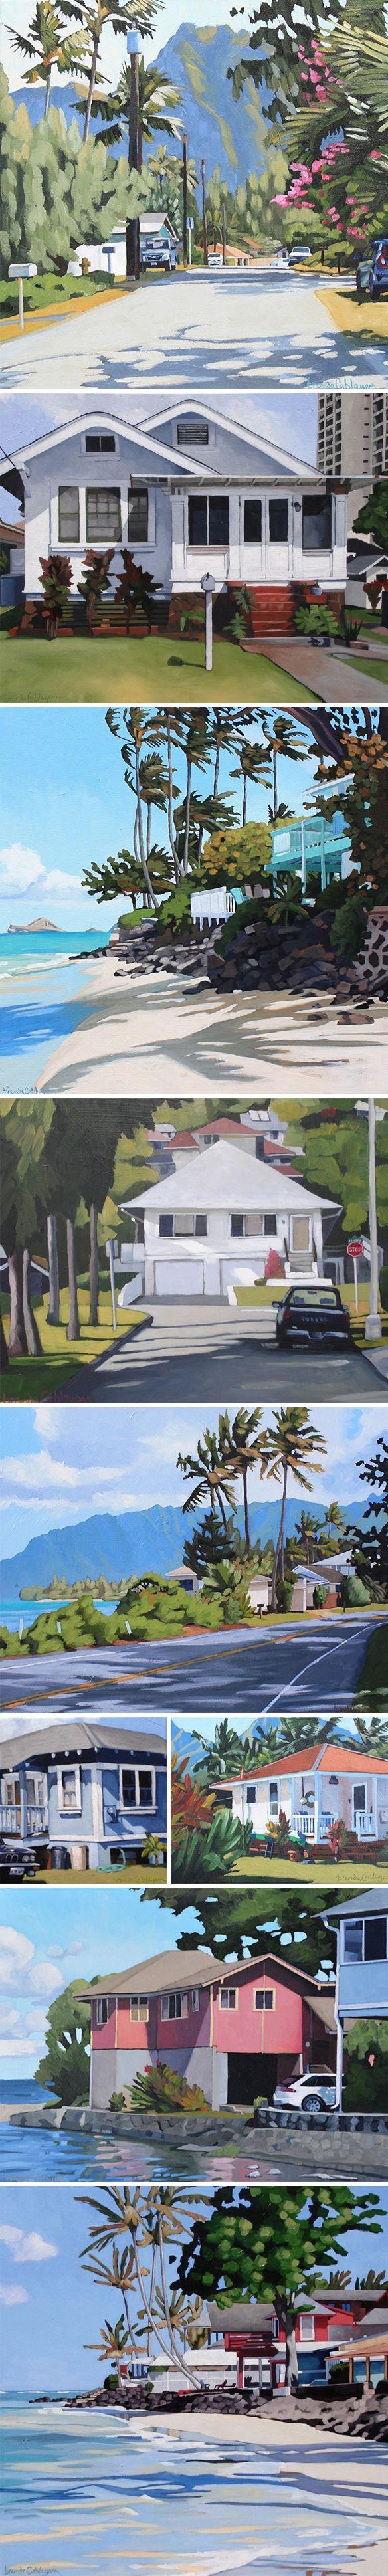 paintings by brenda cablayan